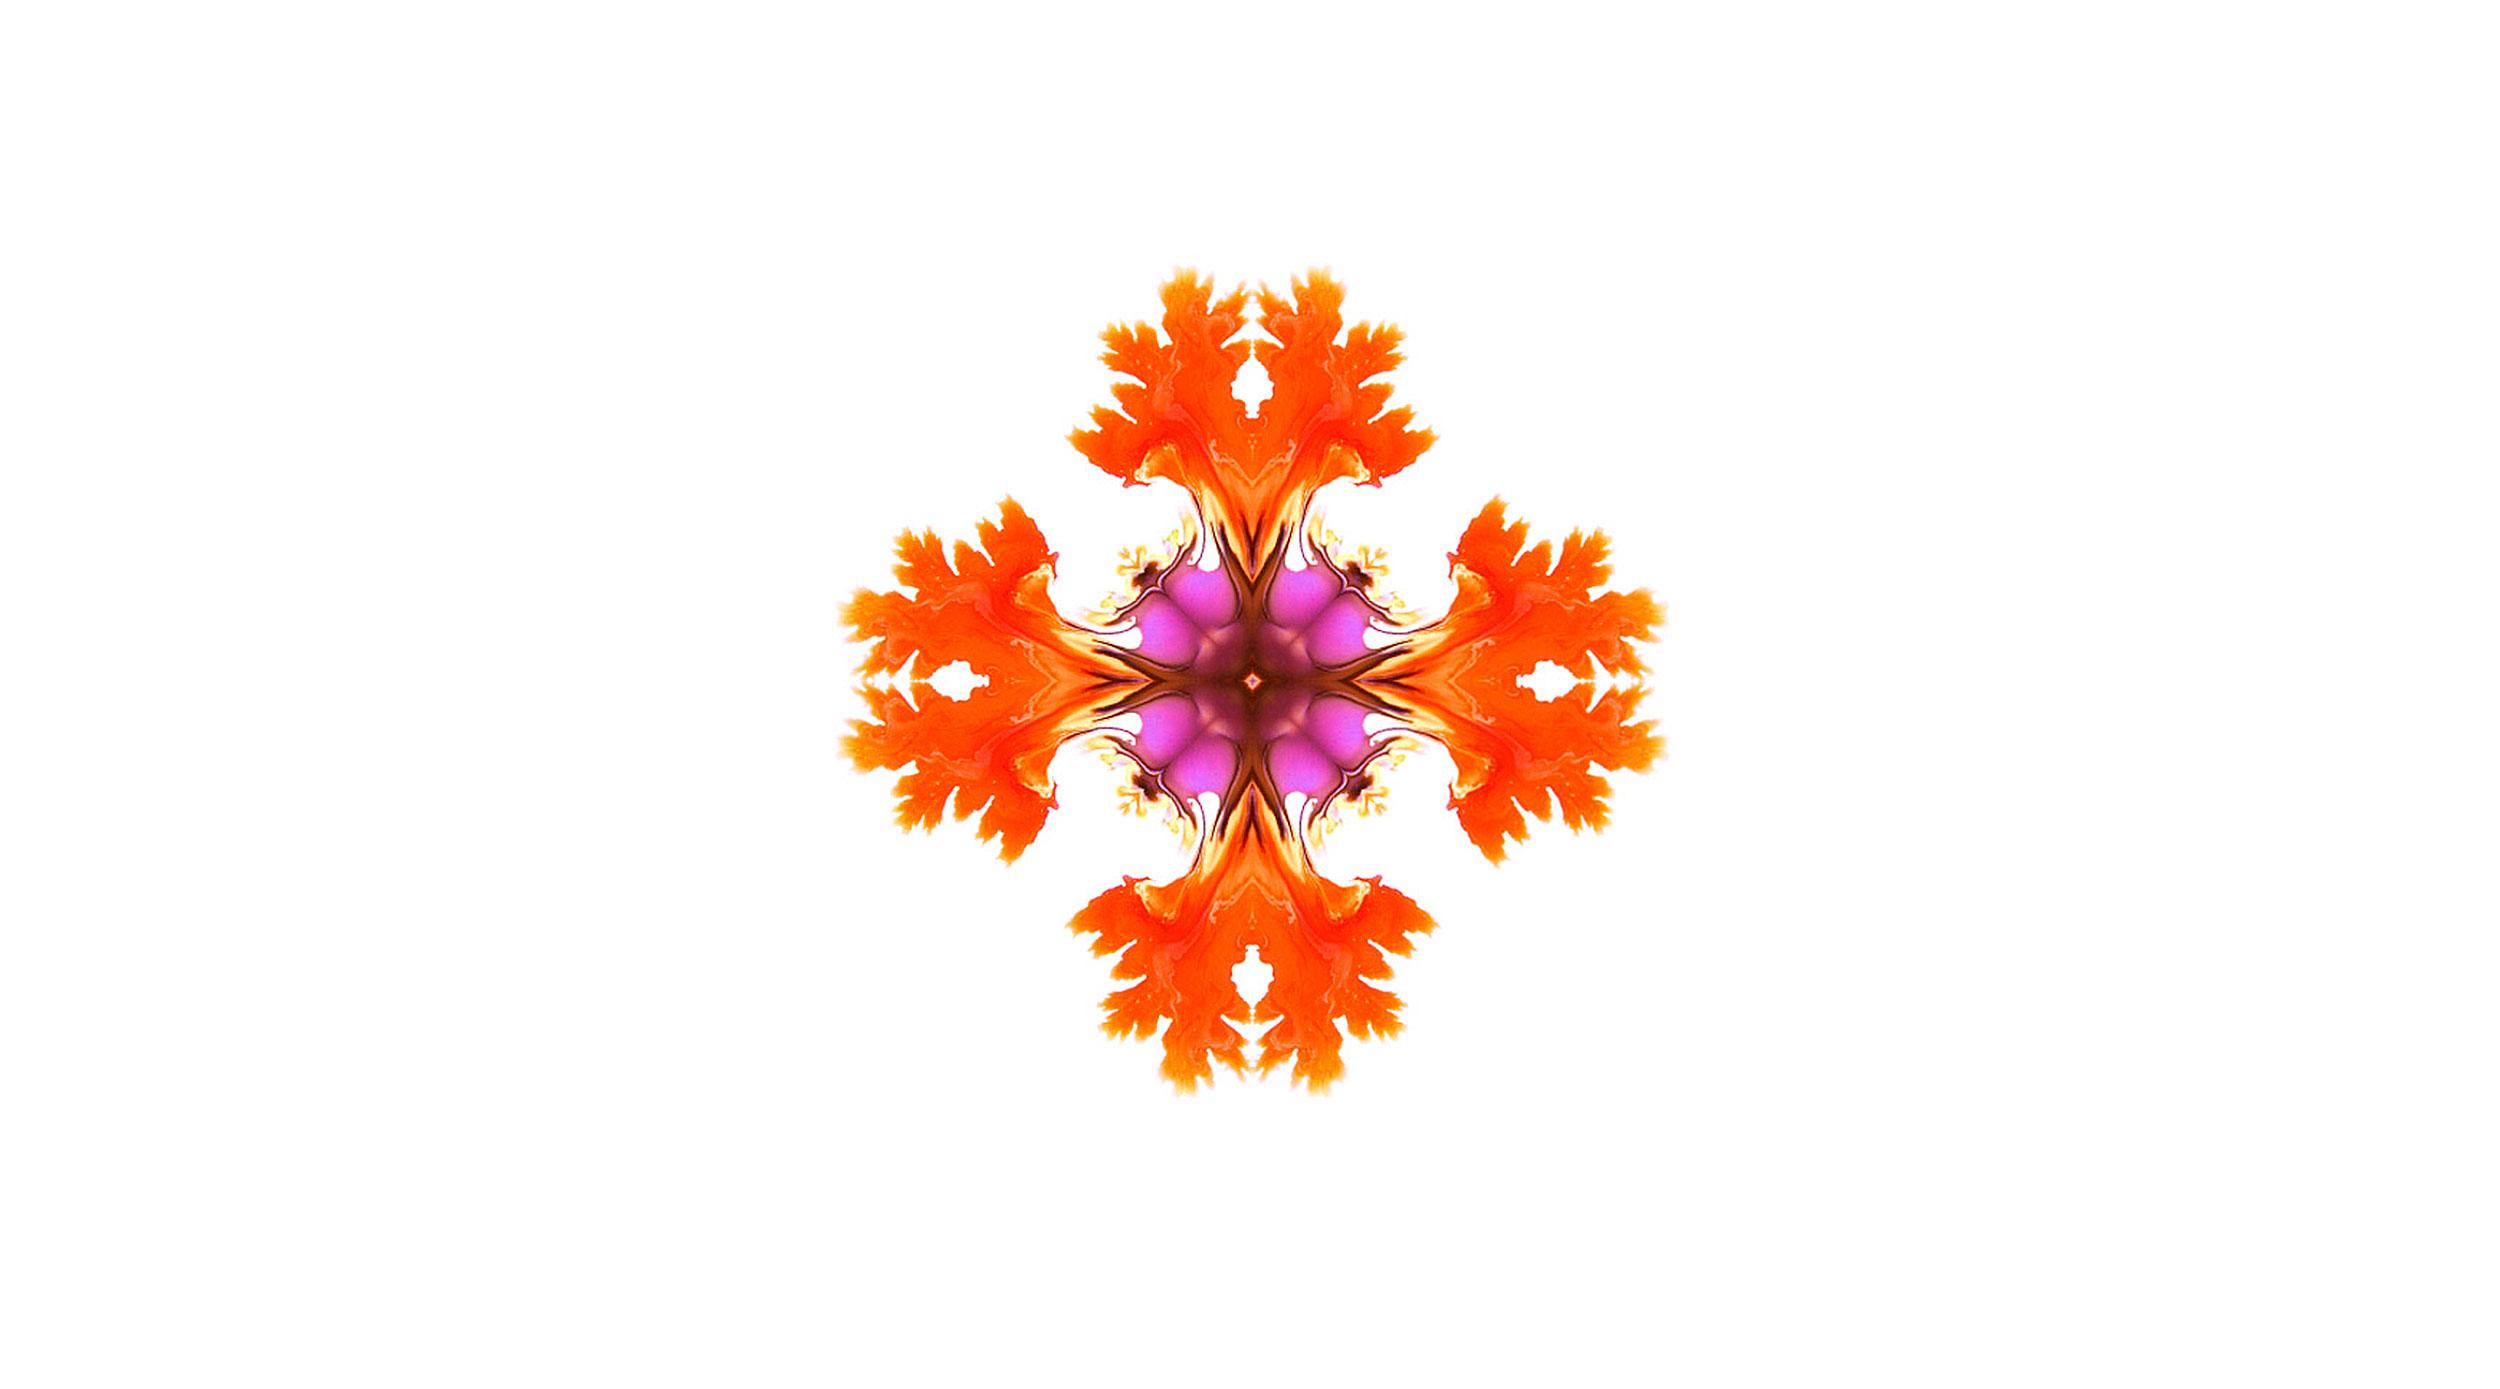 kaleidoscope-6.jpg